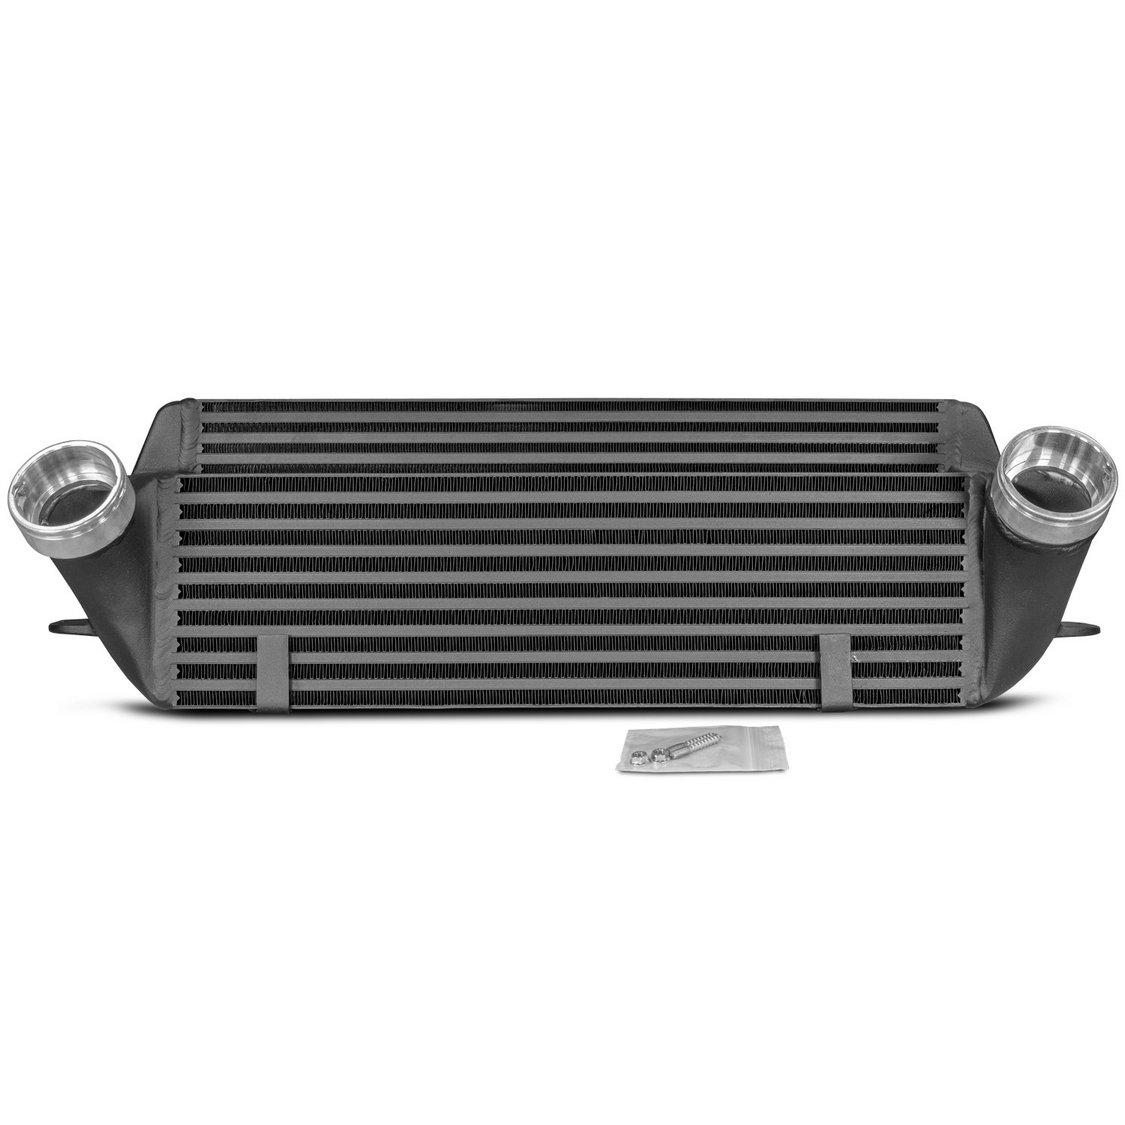 Ladeluftkühler Kit BMW E Serie N47 2,0 Diesel - WAGNERTUNING